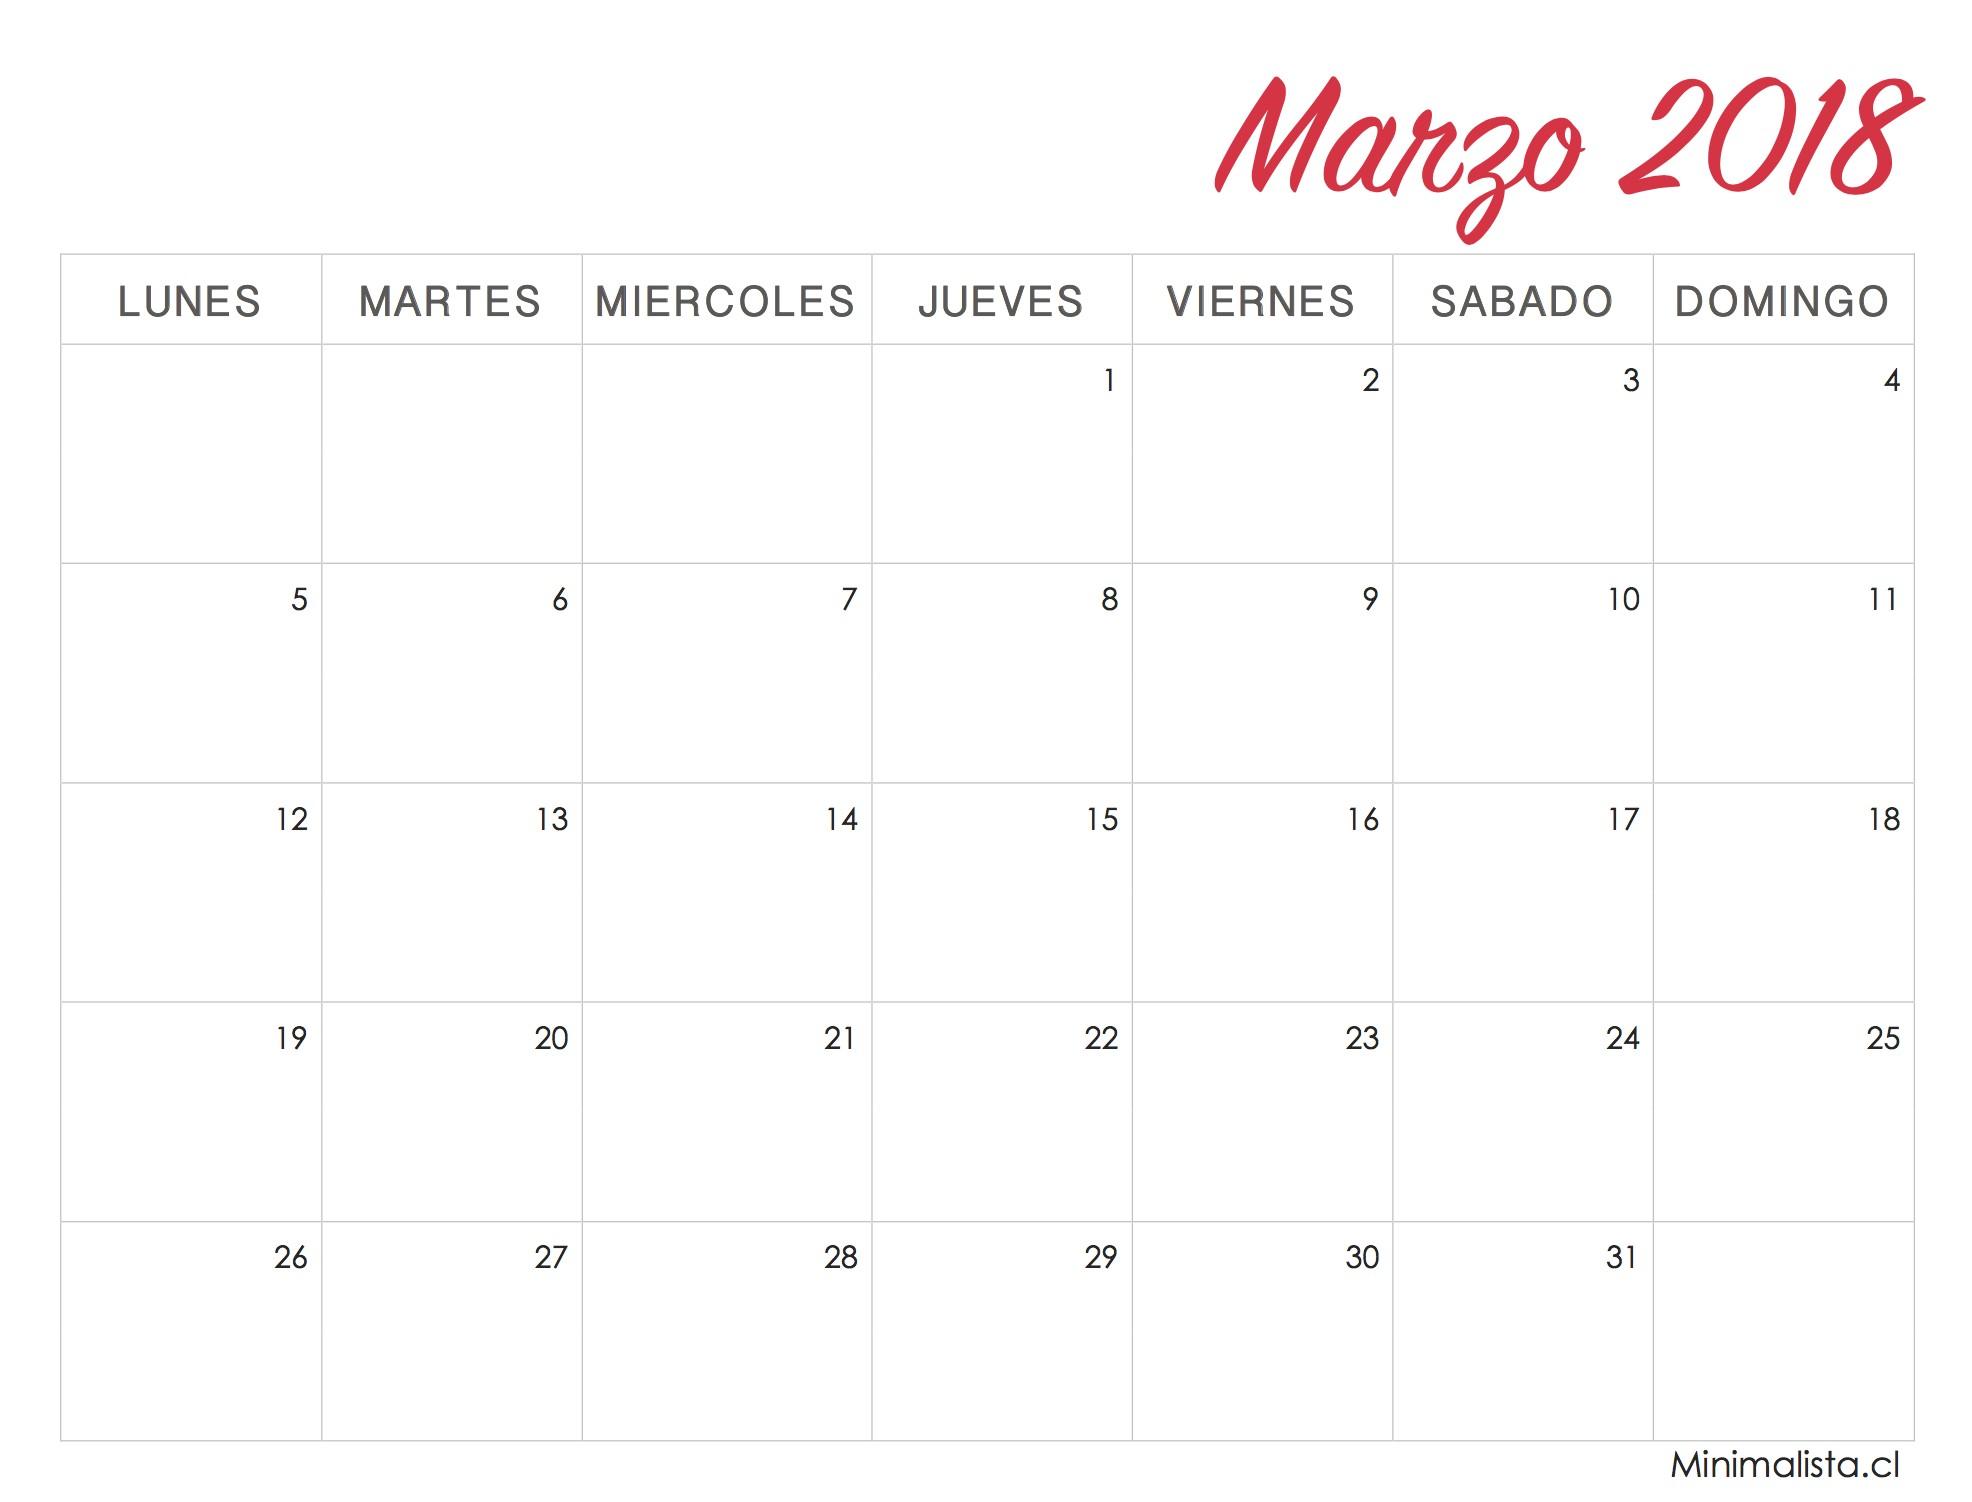 Calendario 2017 Para Imprimir Costa Rica Más Arriba-a-fecha Imprimir Calendario Latest Agosto Calendario Para Imprimir top Of Calendario 2017 Para Imprimir Costa Rica Actual Revista Pro Veritatem U I A